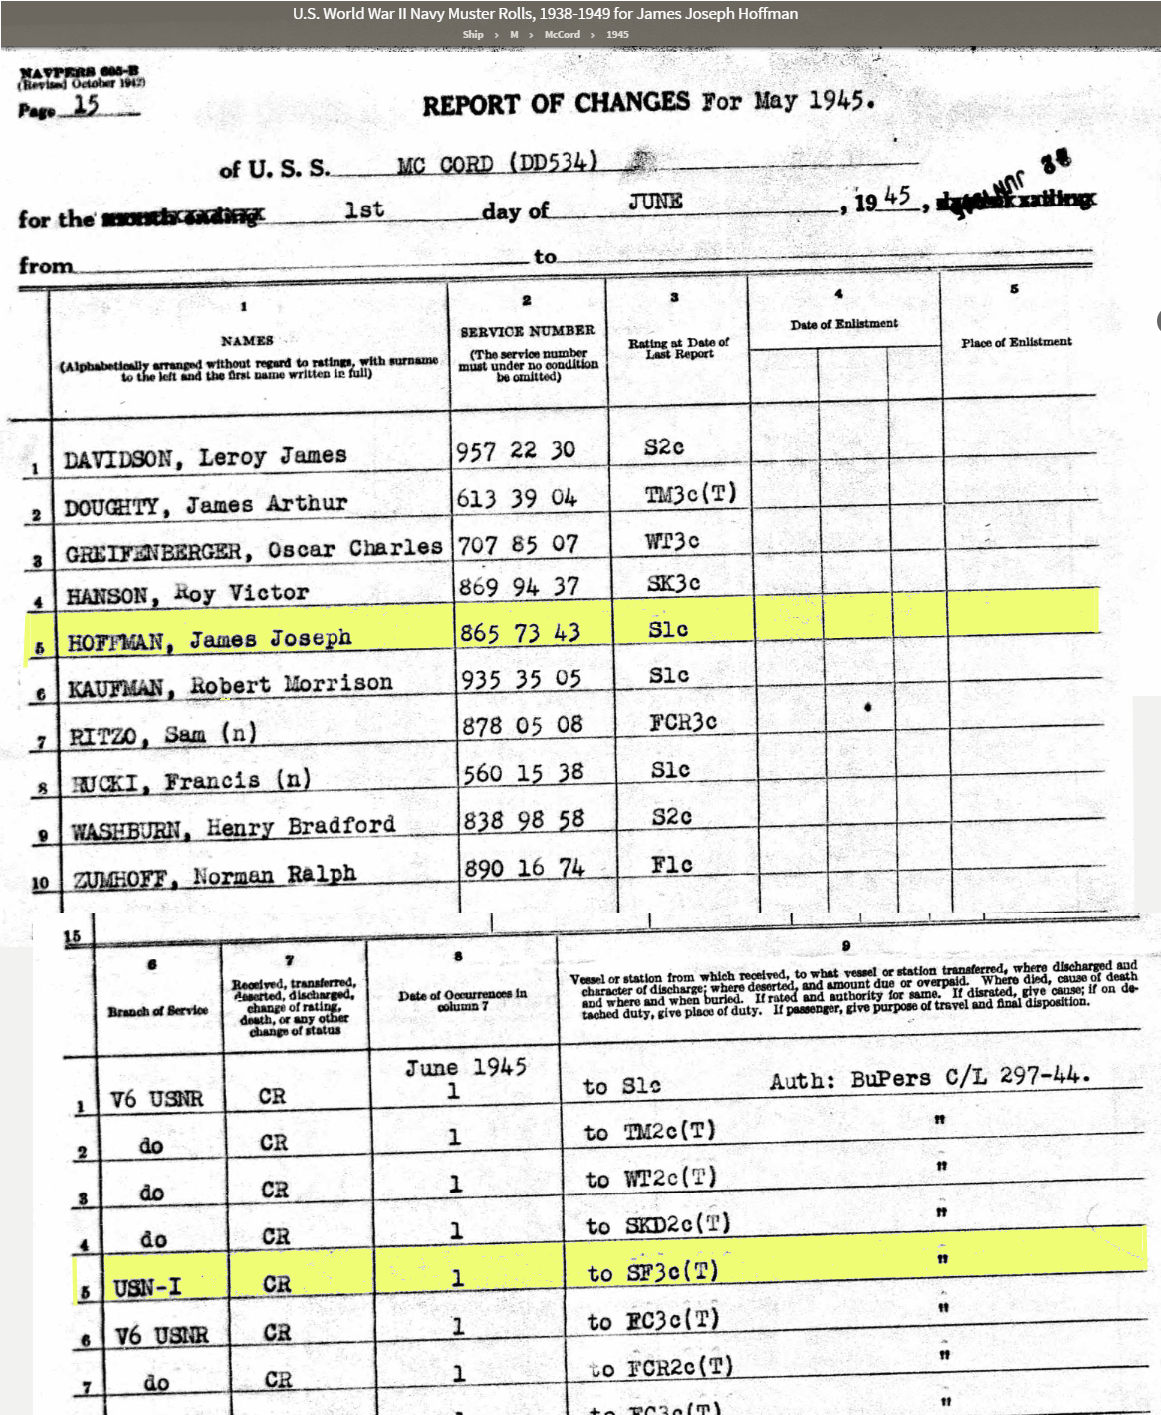 James Joseph Hoffman Rating Change JUN 45.jpg